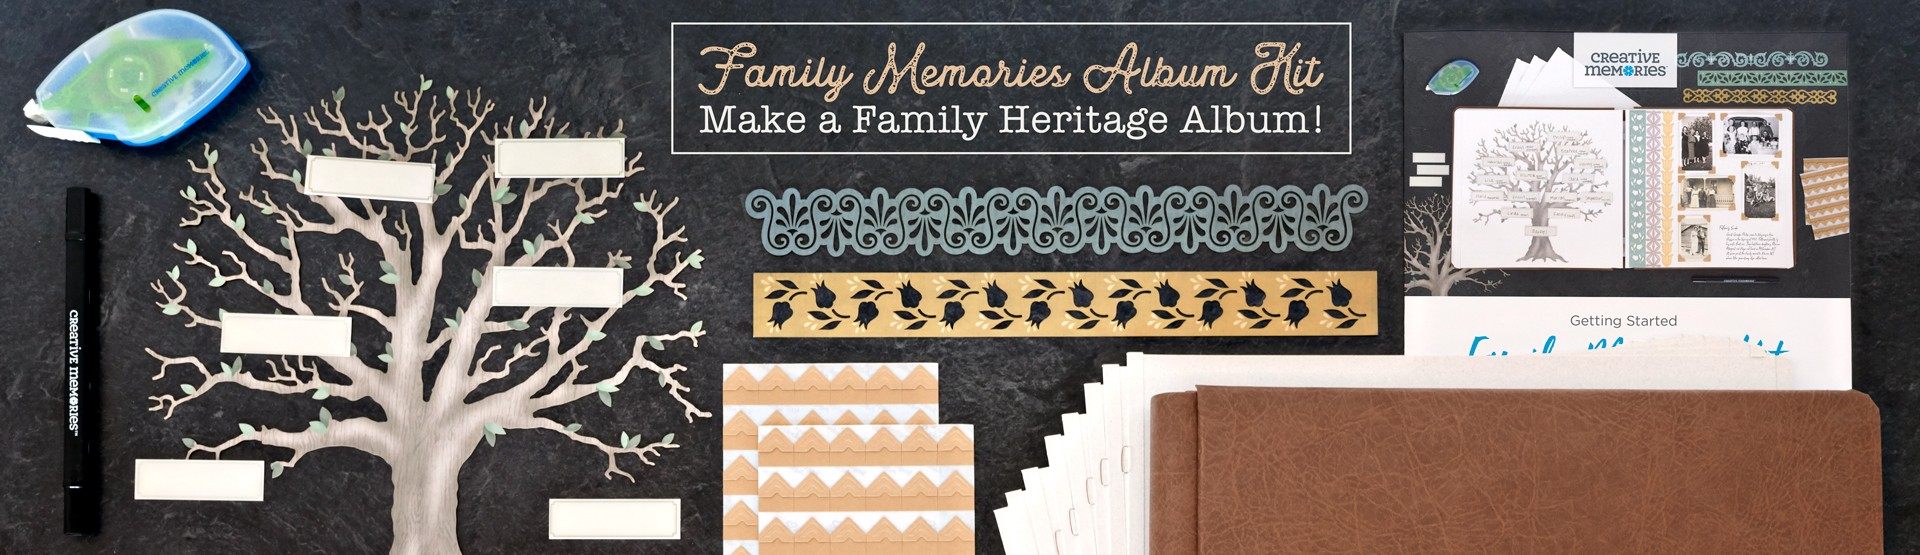 Heritage Albums: Family Memories